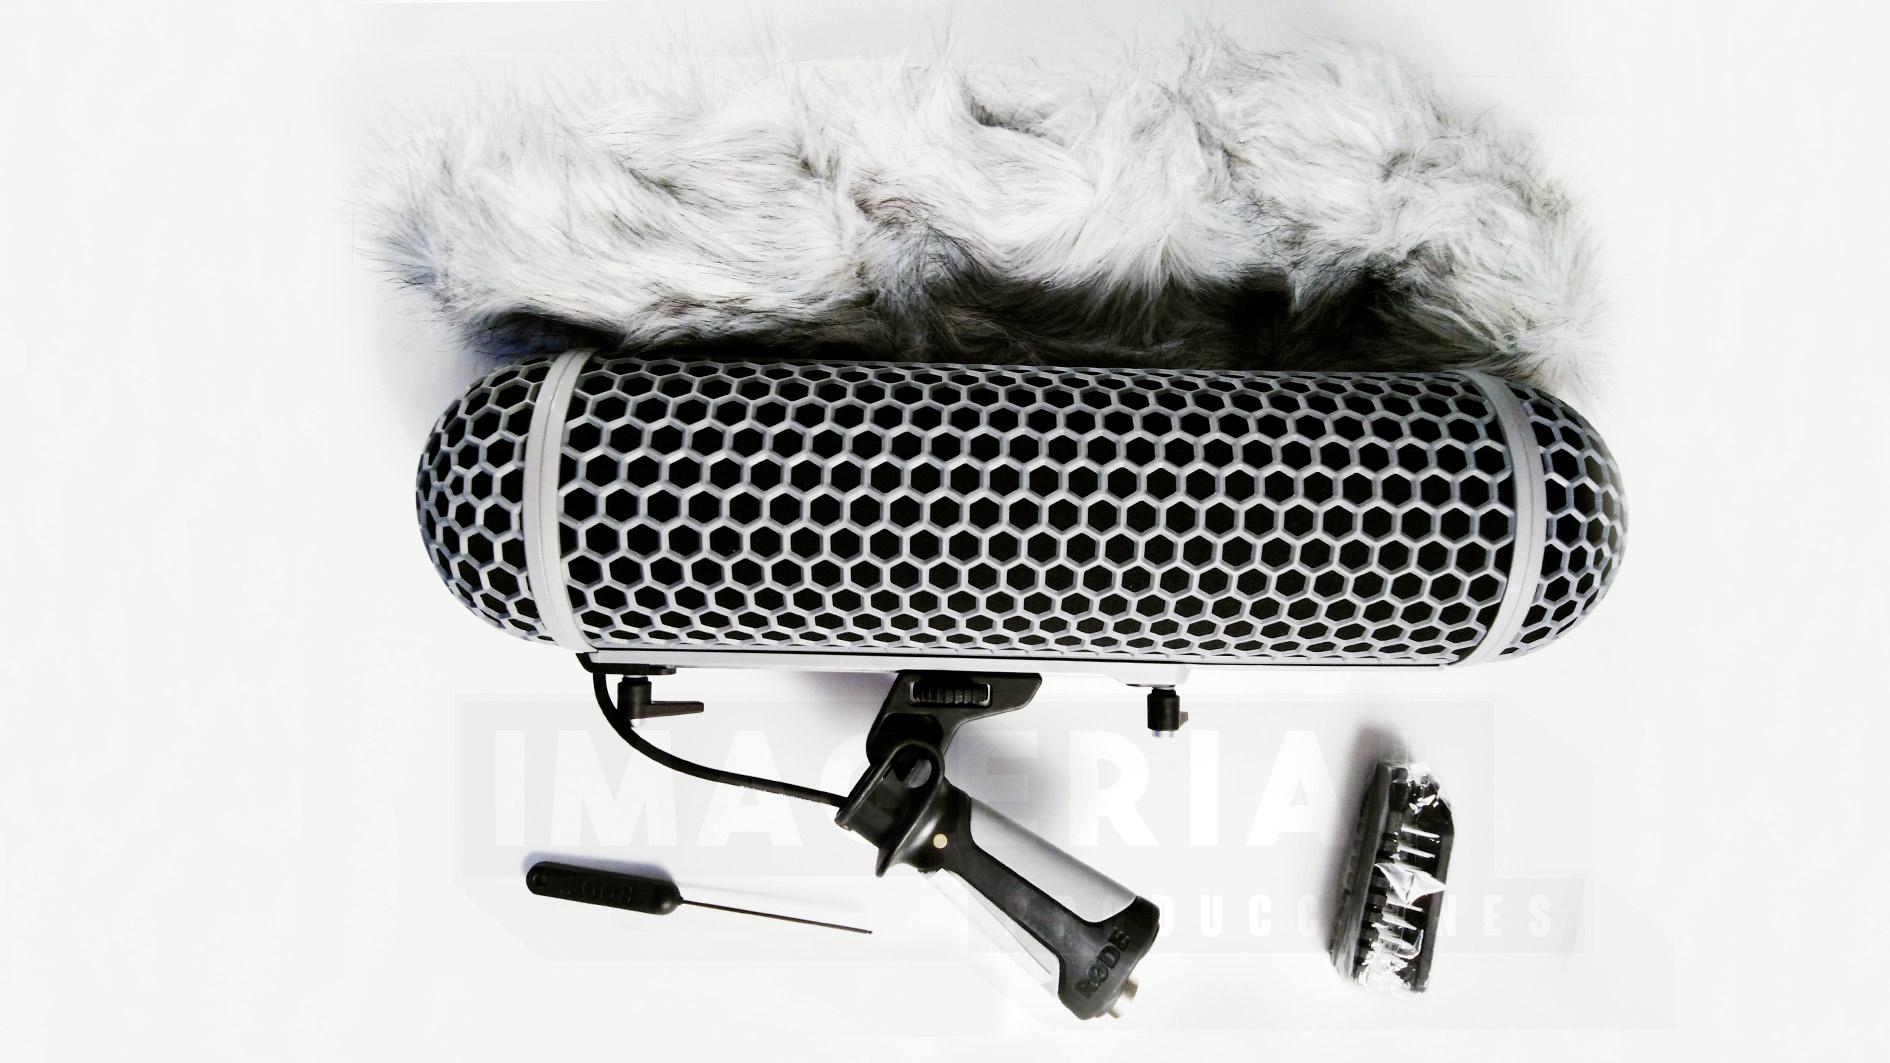 RODE BLIMP. IMAGERIAL PRODUCCIONES ALQUILER DE EQUIPOS AUDIOVISUALES EN MADRID.